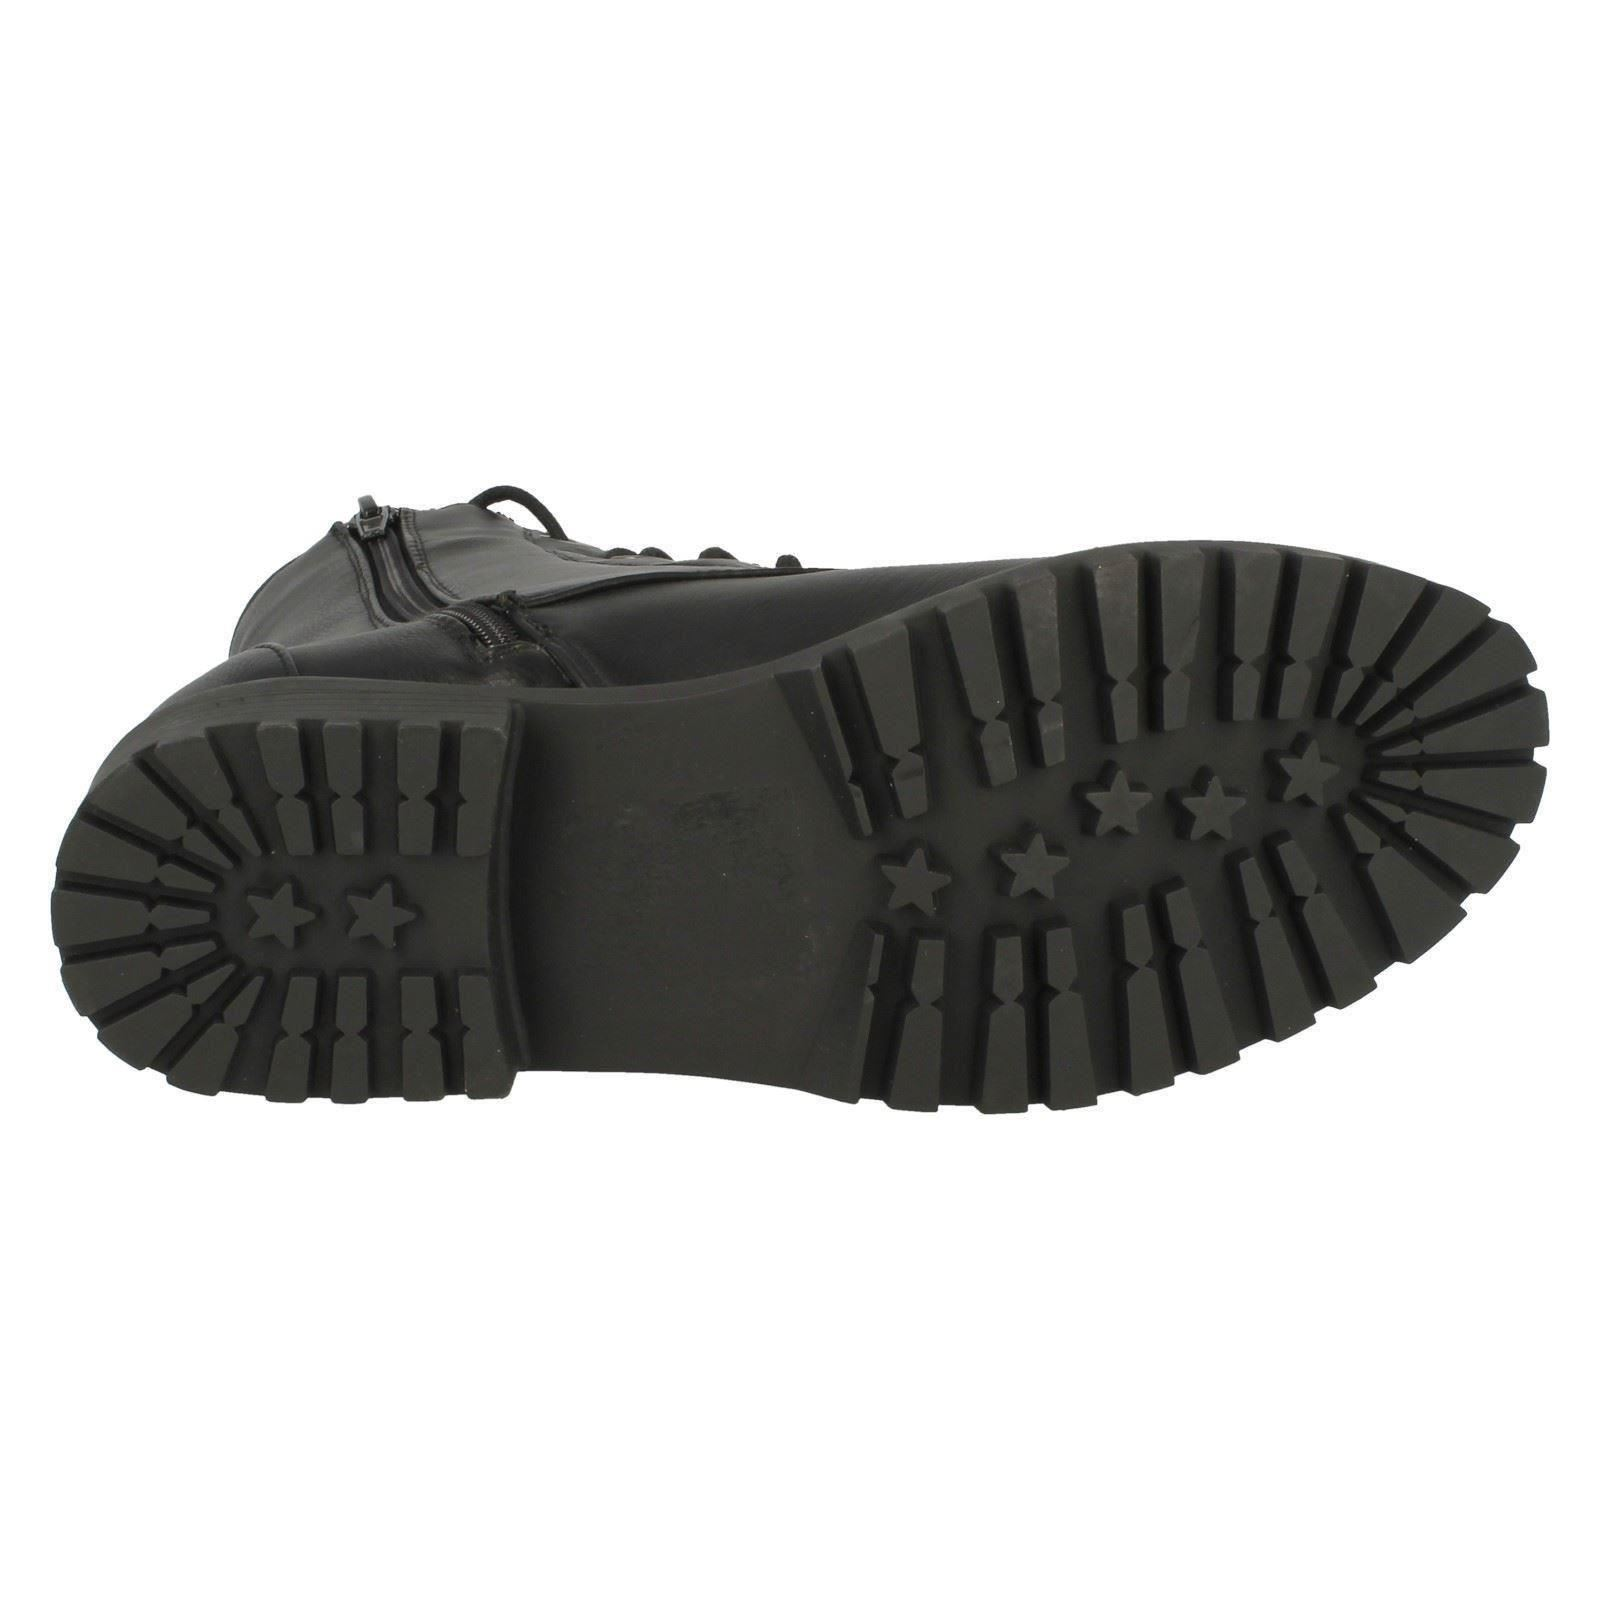 Spot On Ladies Combat Boots